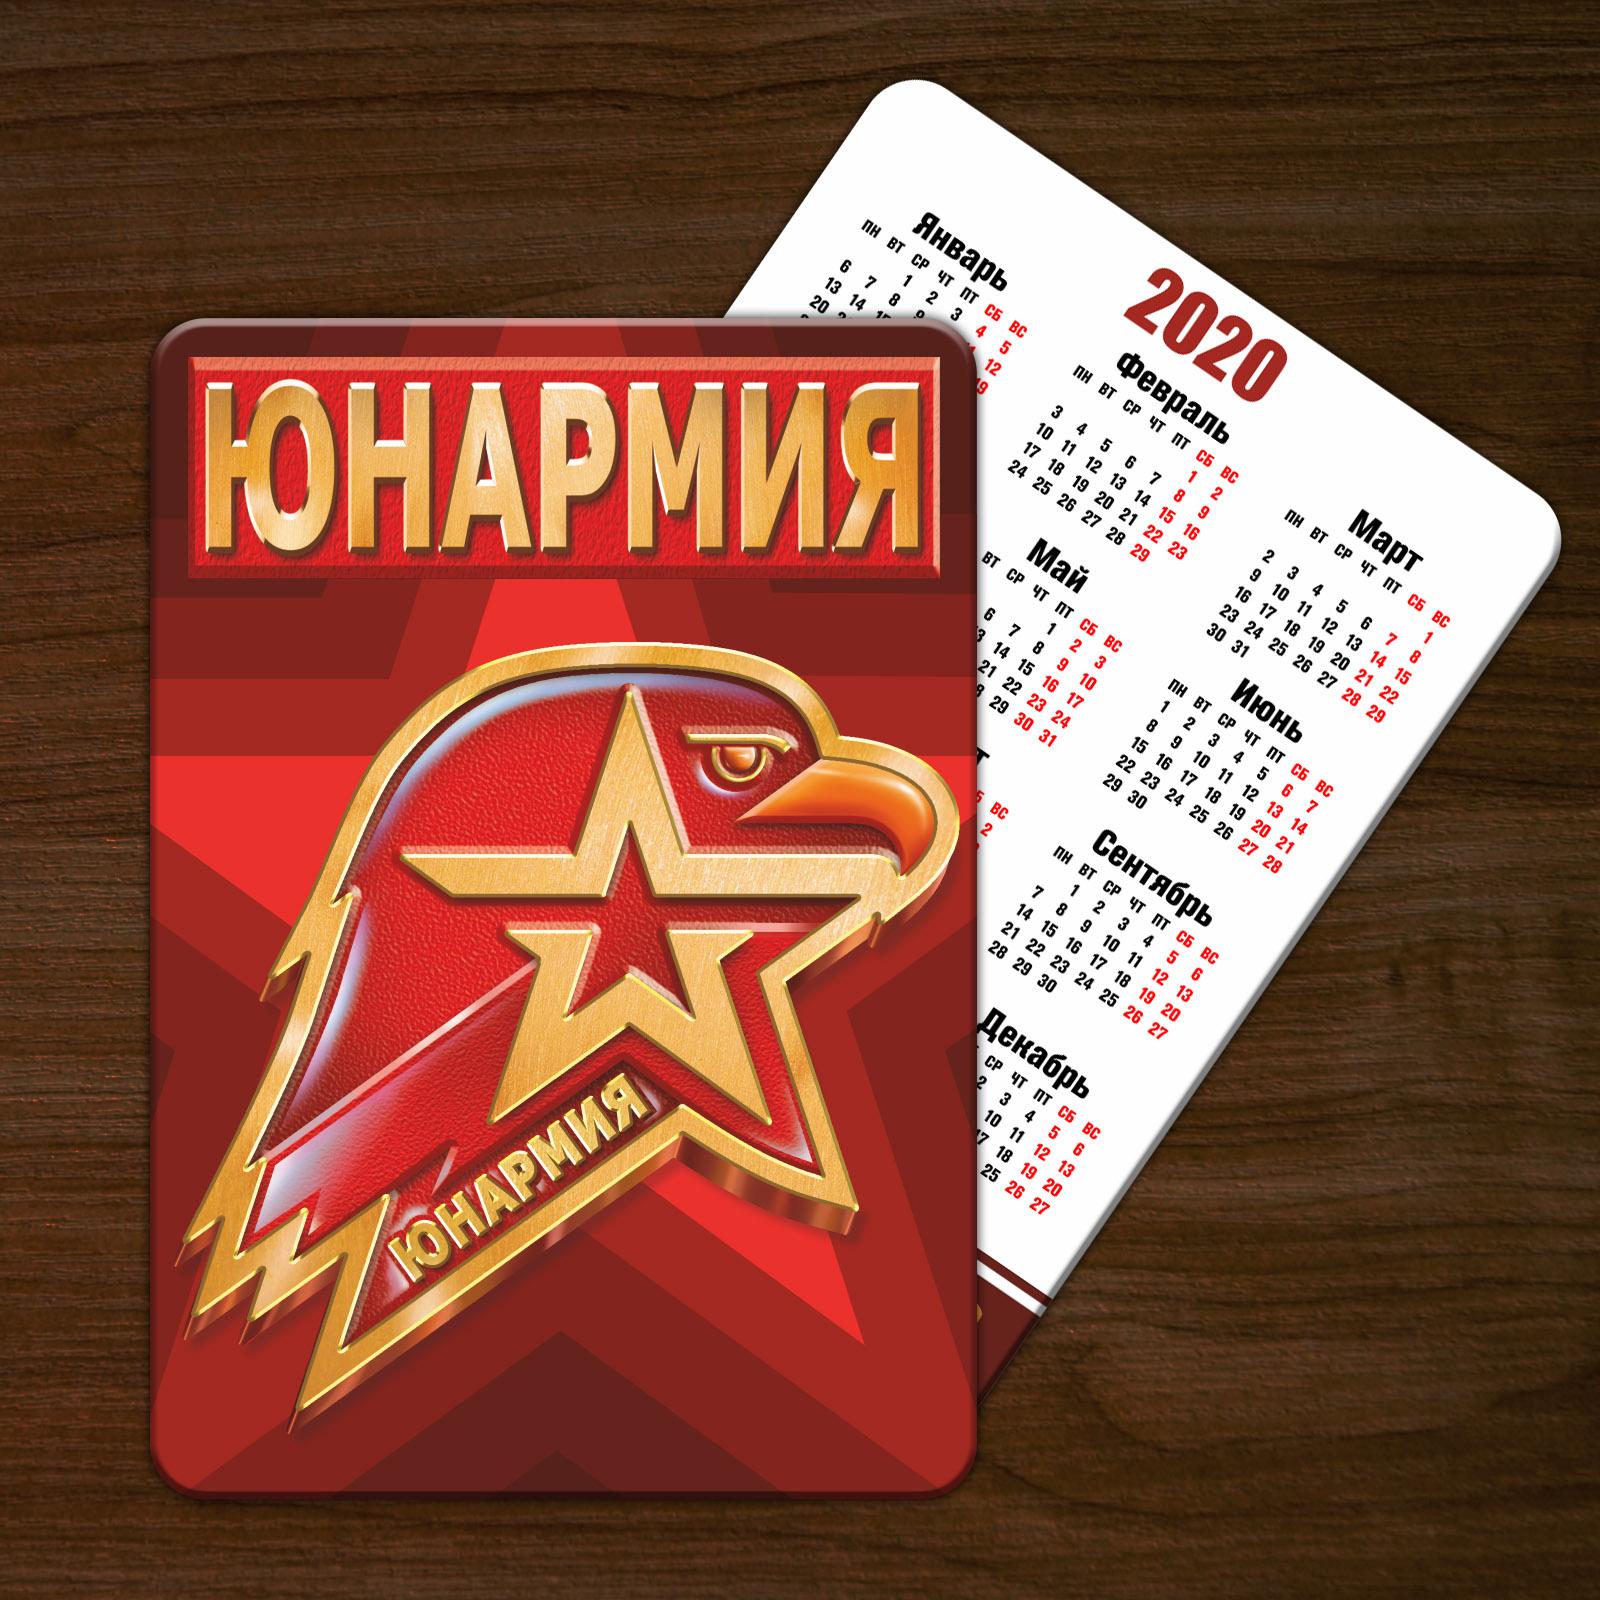 Молодежный карманный календарик Юнармия (2020 год, 2019 год)